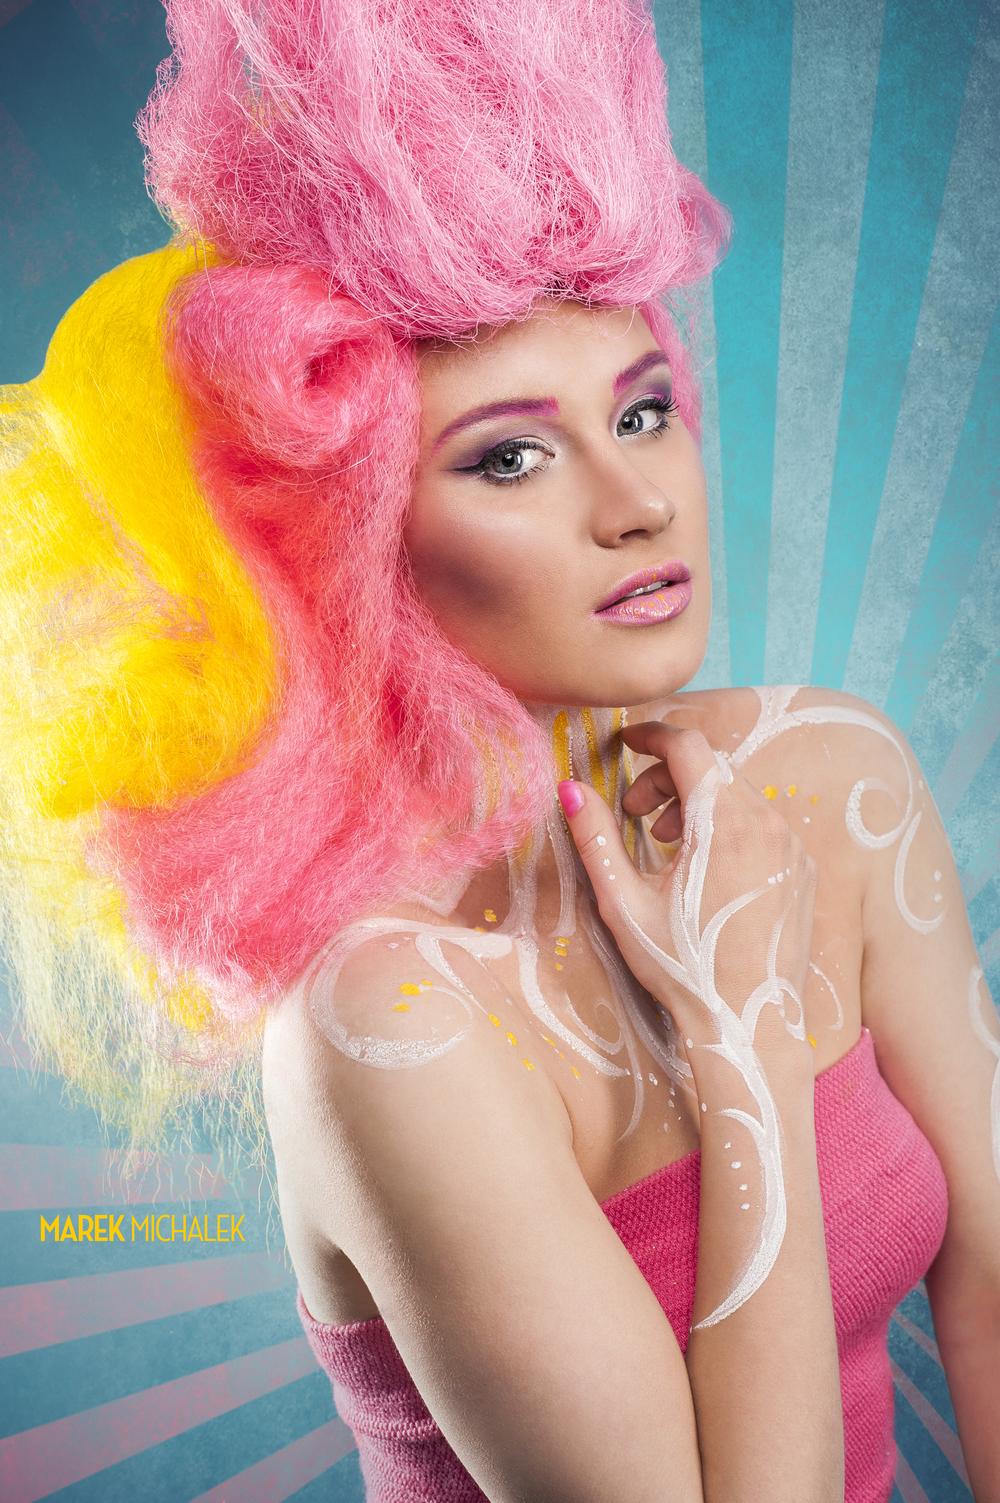 Hamilton Creative Fashion Photographer - Marek Michalek 02.jpg